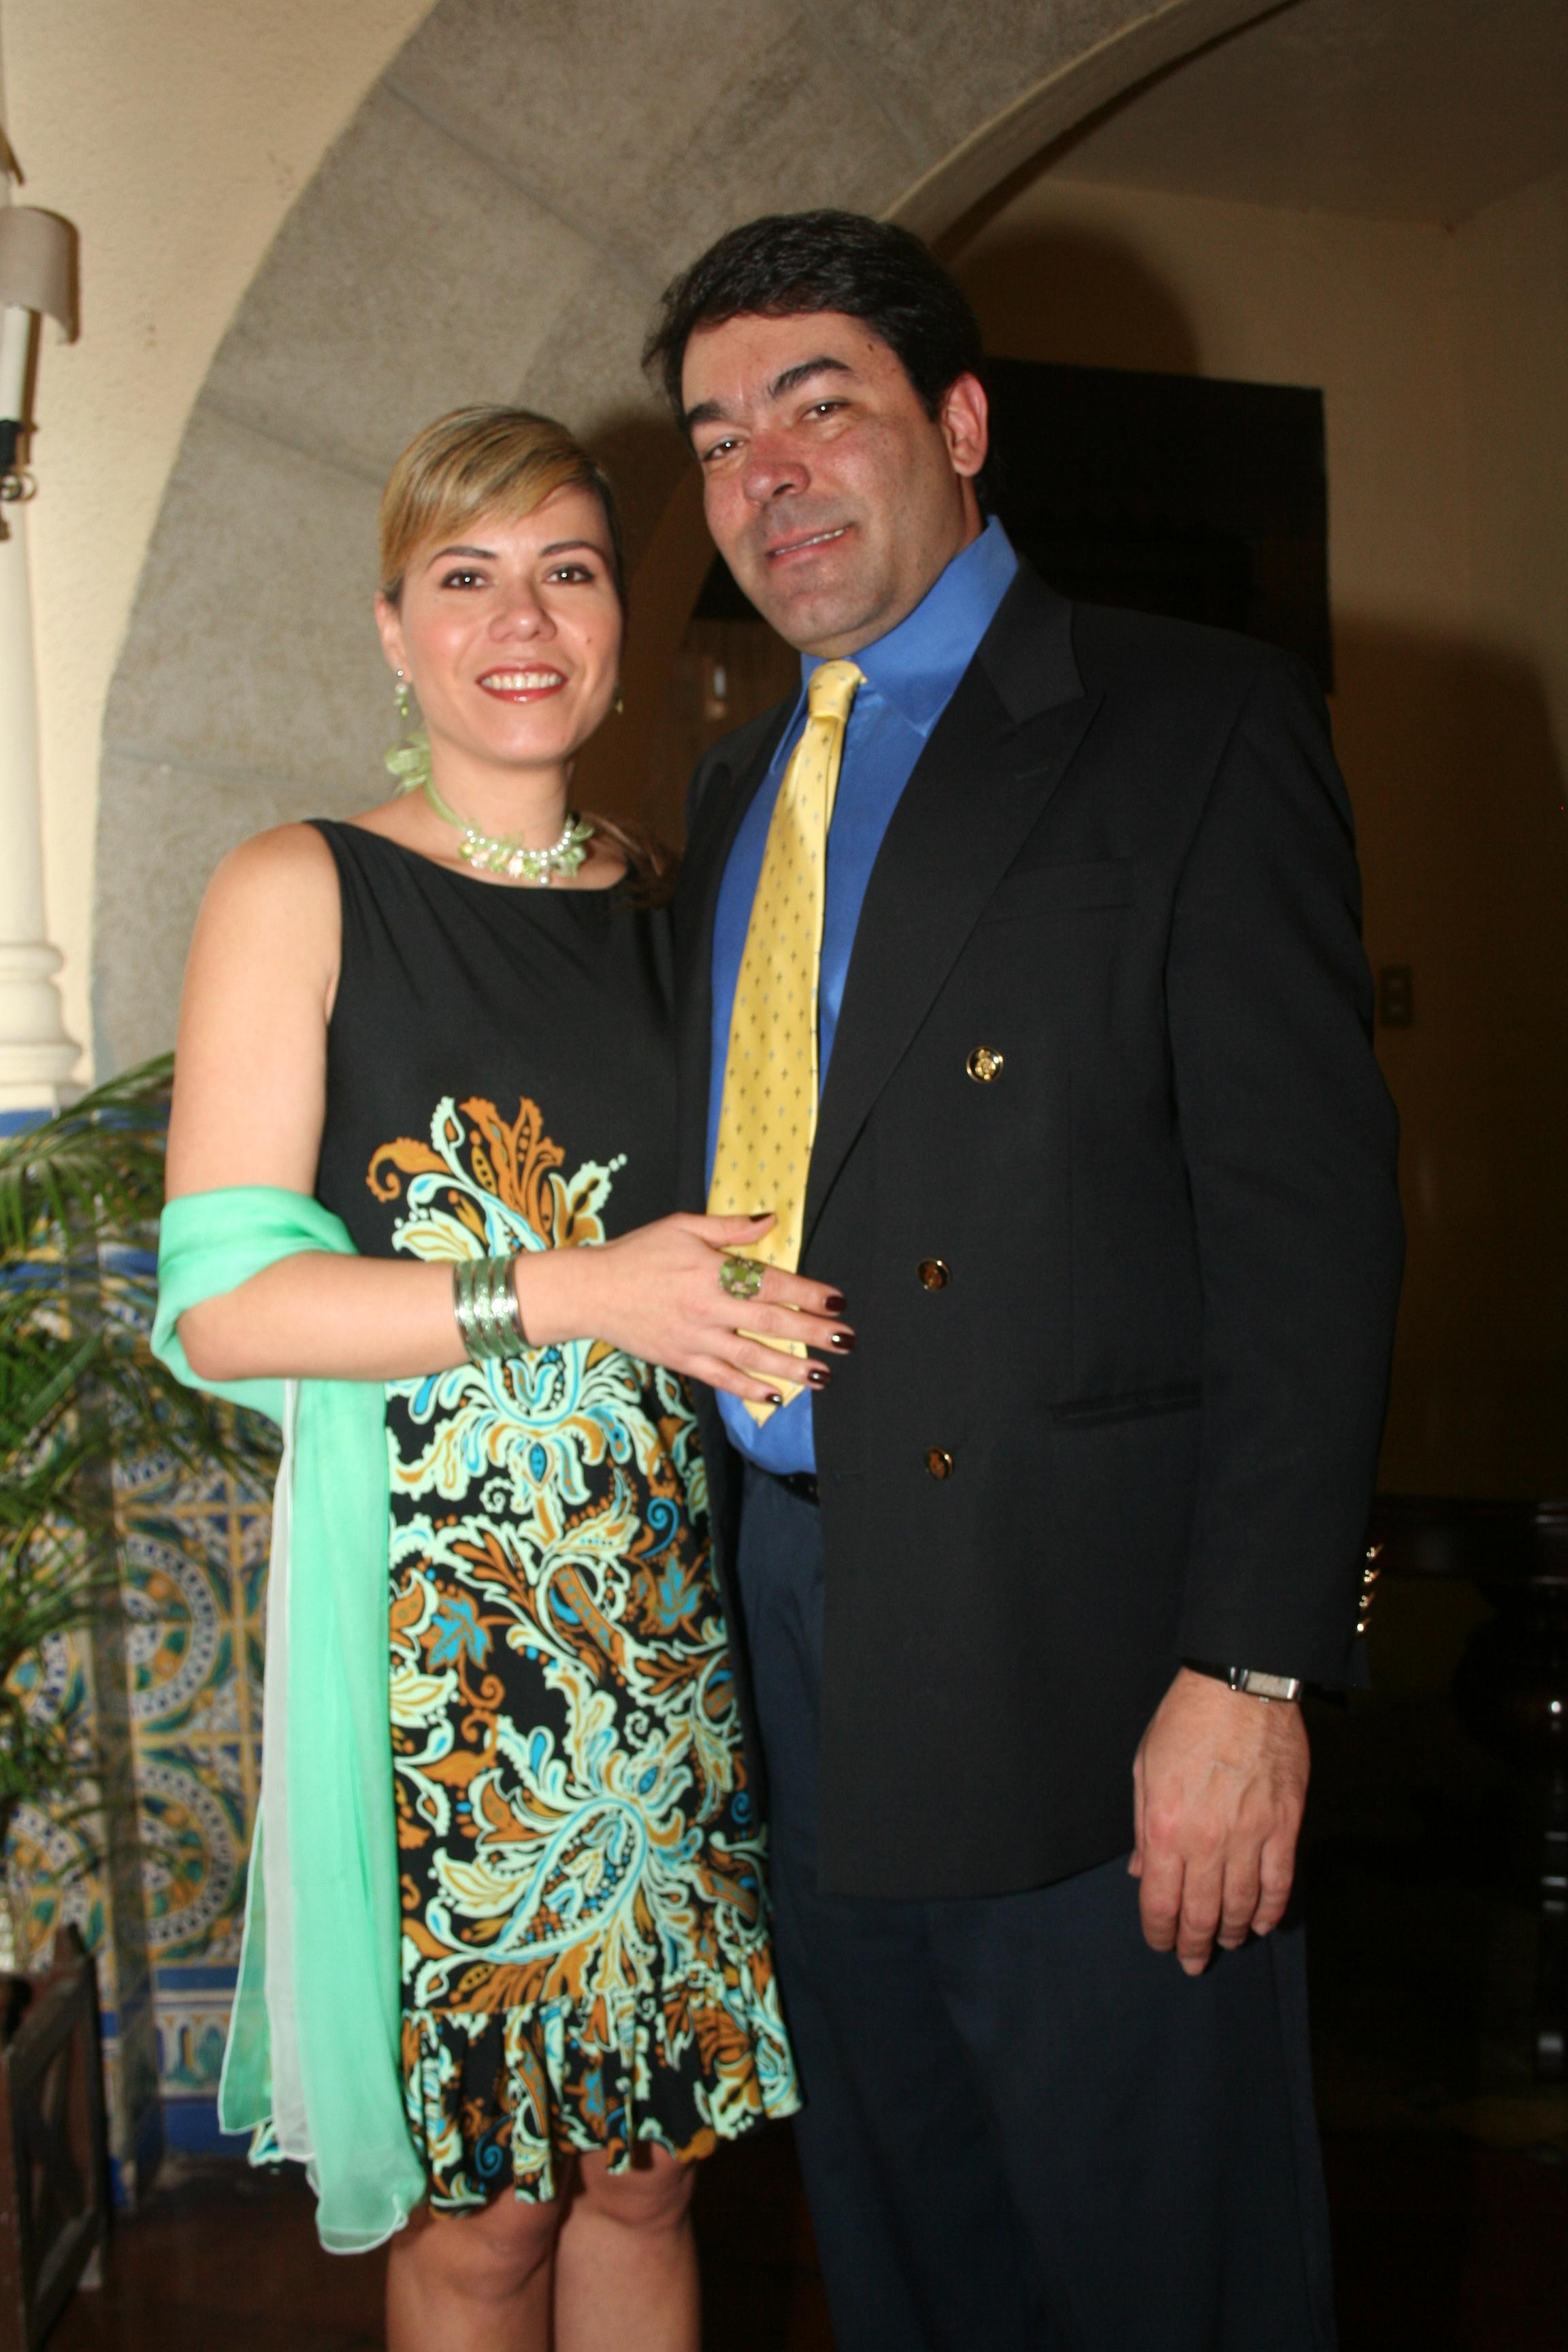 Marianna Rivero de Bermudez y Jeau Paul Bermudez Fernandez